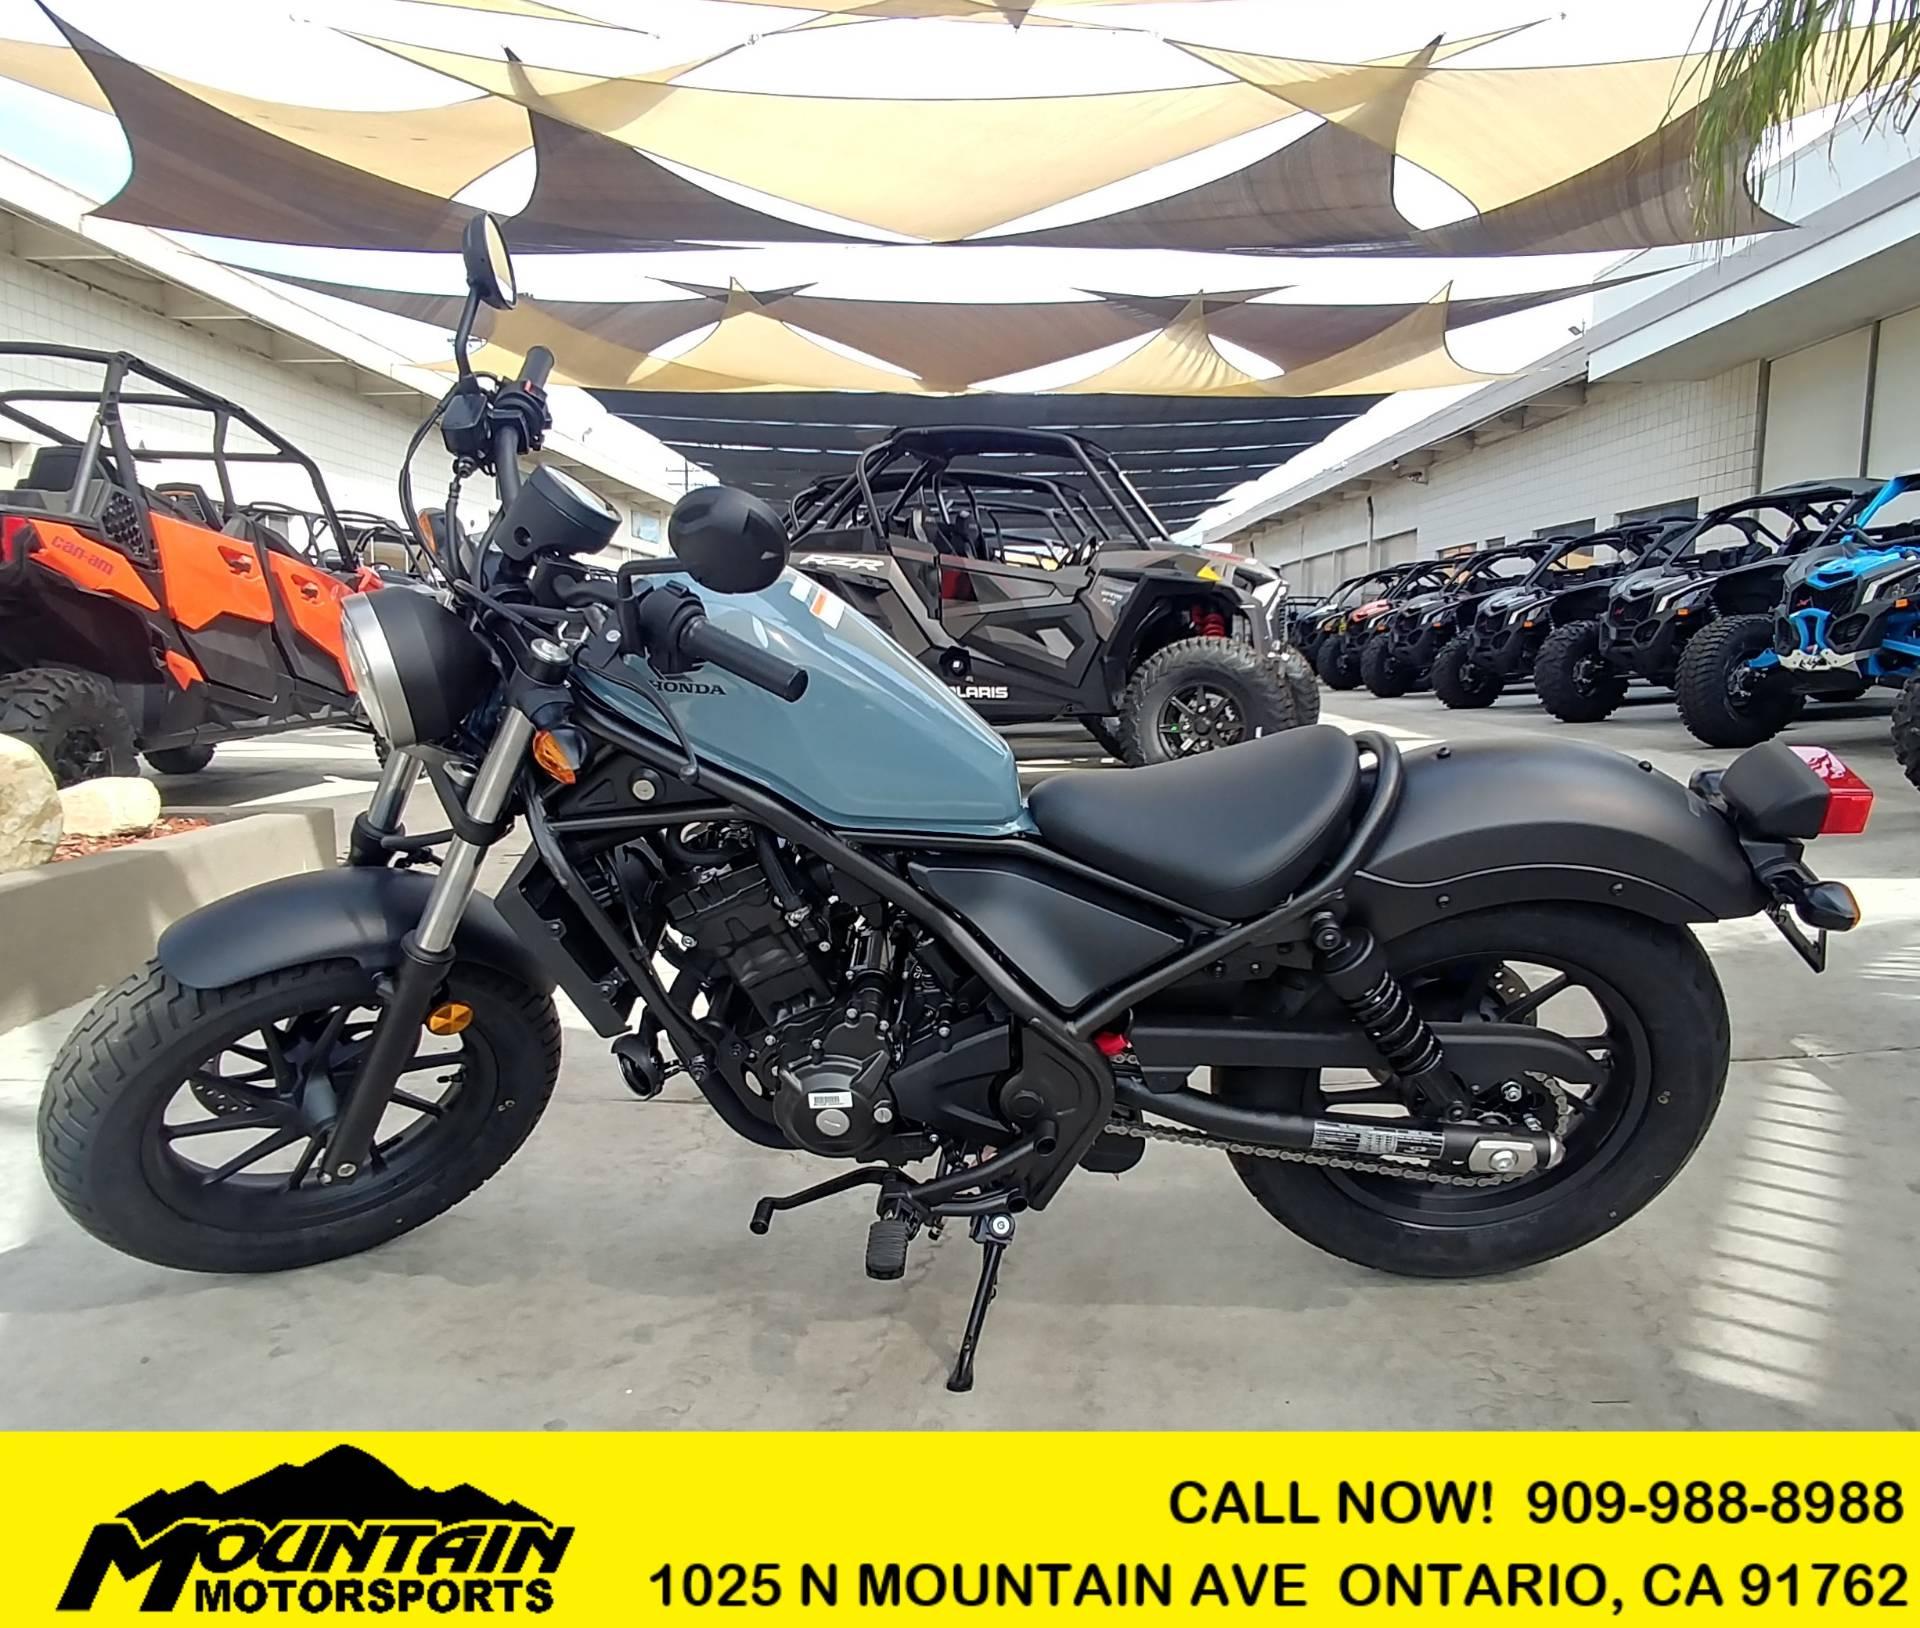 2019 Honda Rebel 300 for sale 77411